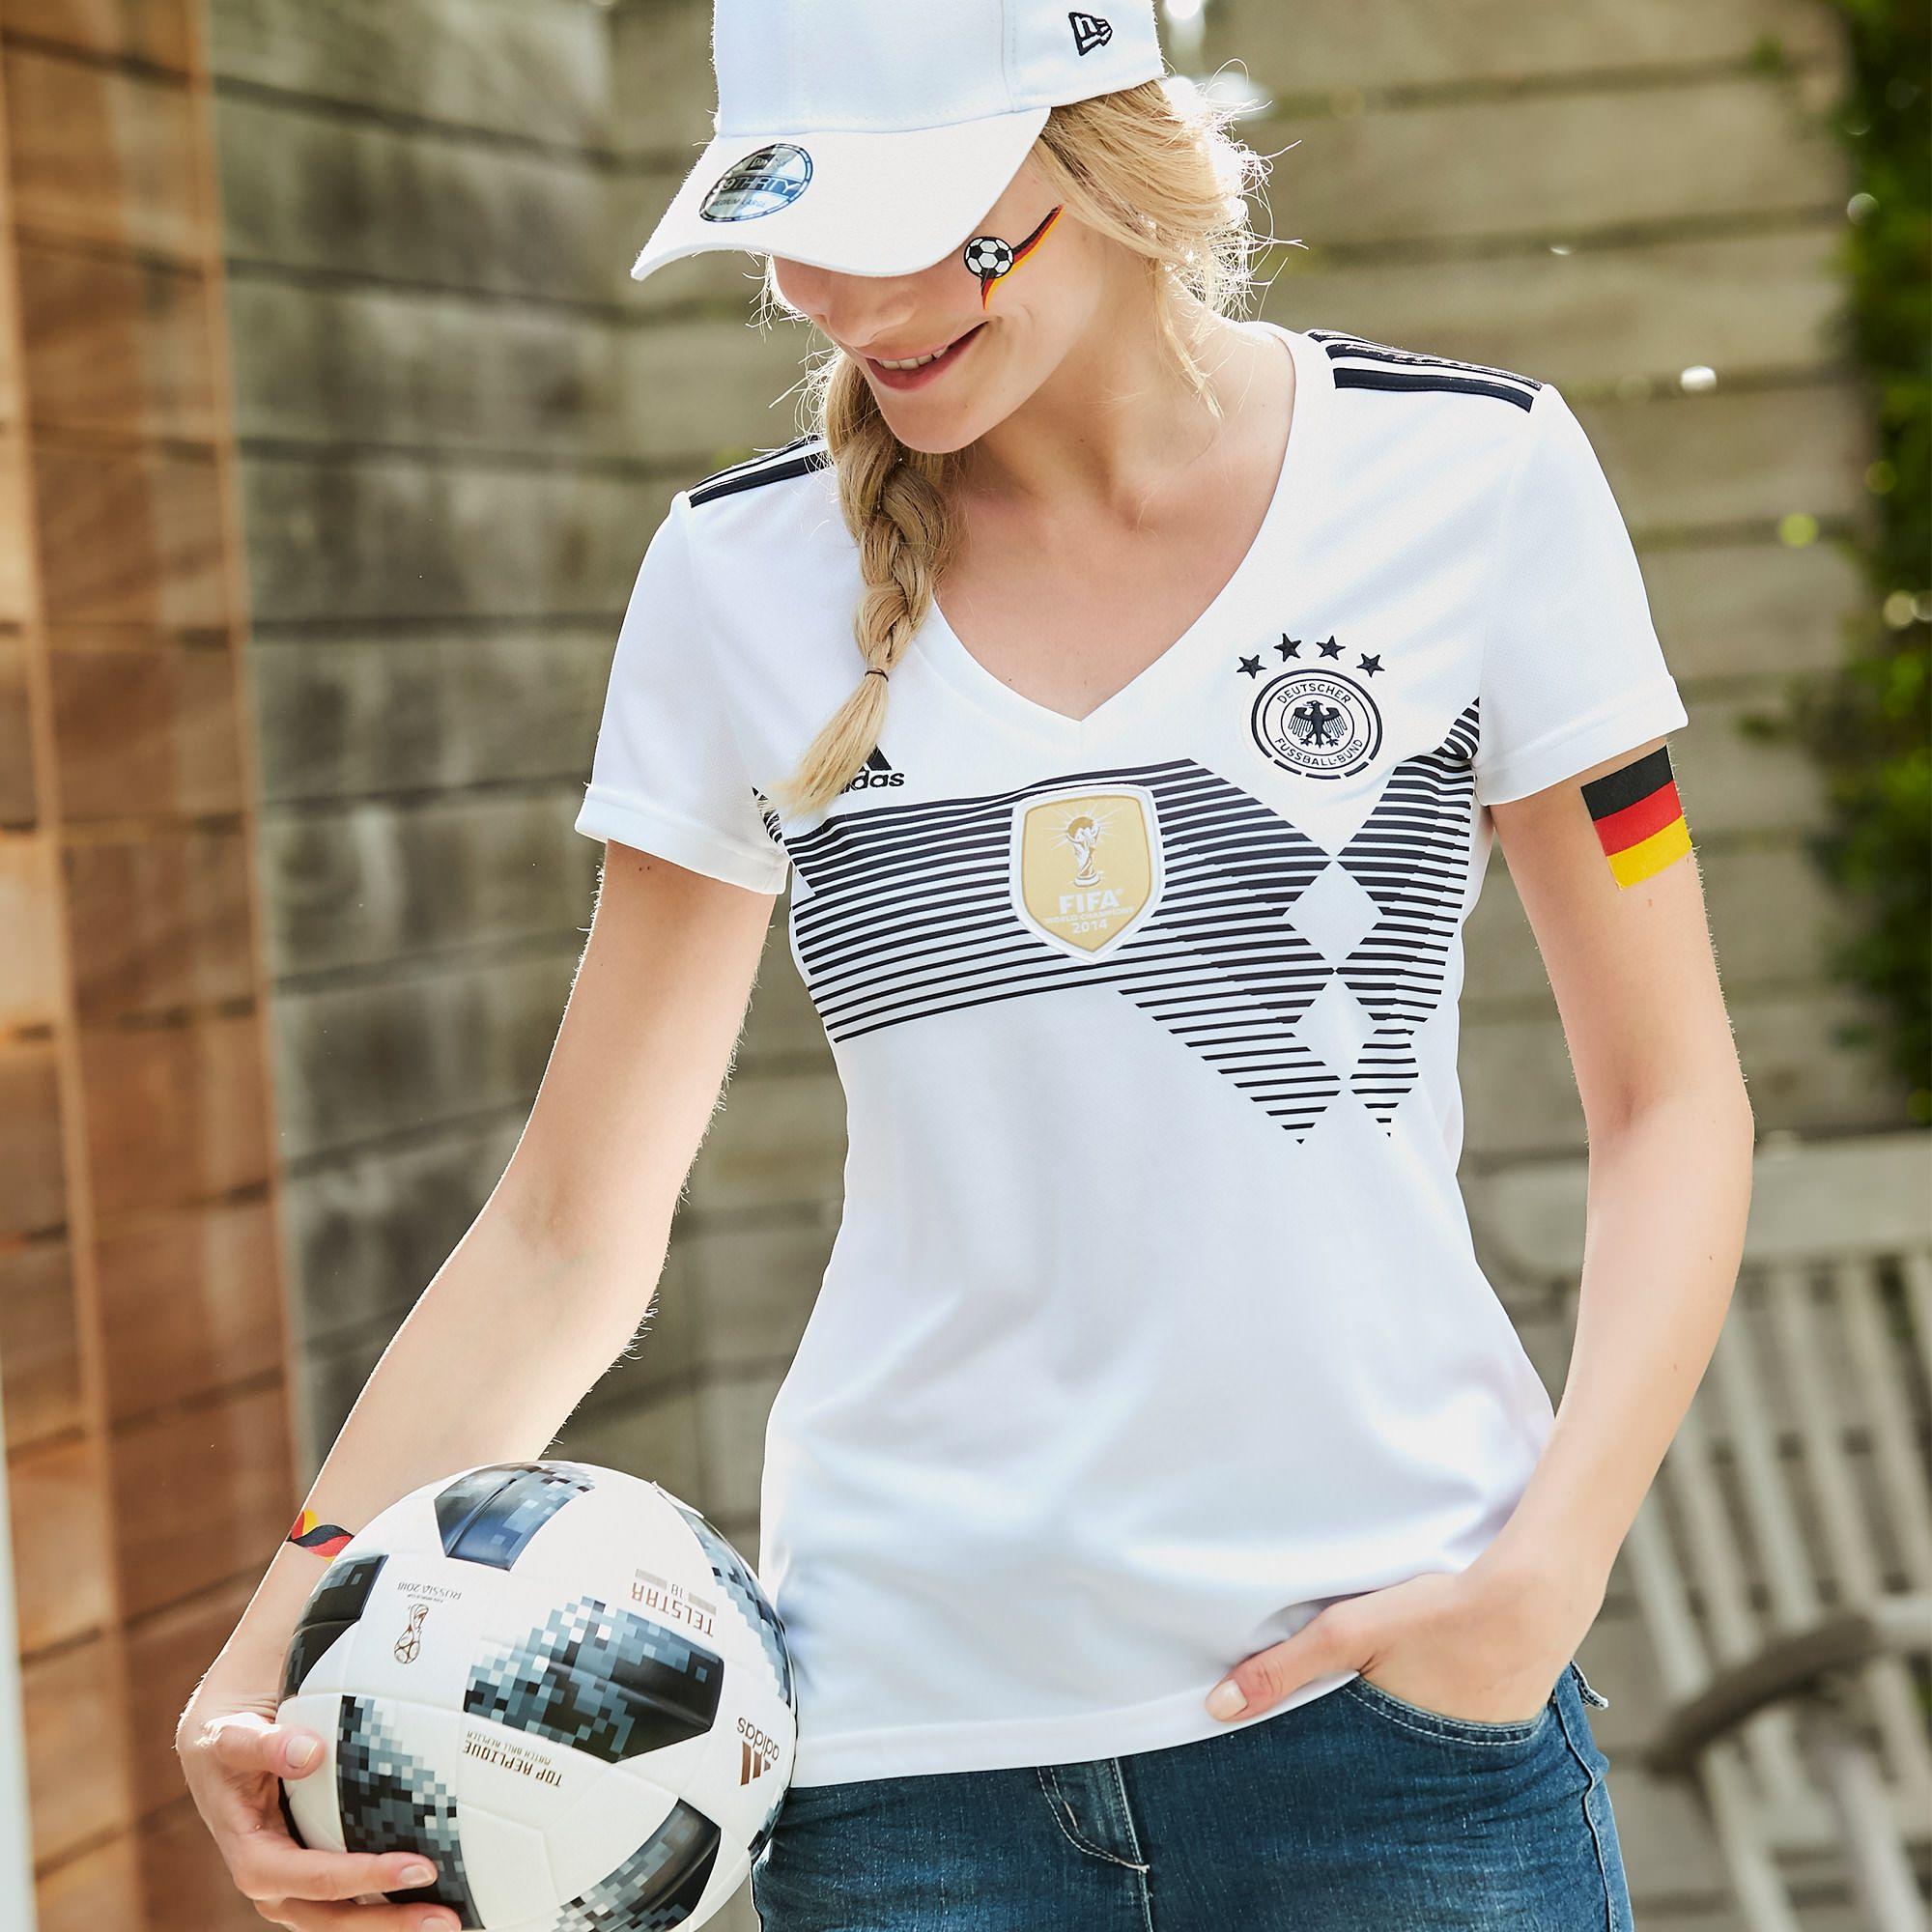 Adidas Performance Trikot 2018 Dfb Heimtrikot Damen Ob Public Viewing In Der Stadt Oder Gartenparty Hie Trikot Deutschland Trikot Fussball Weltmeisterschaft